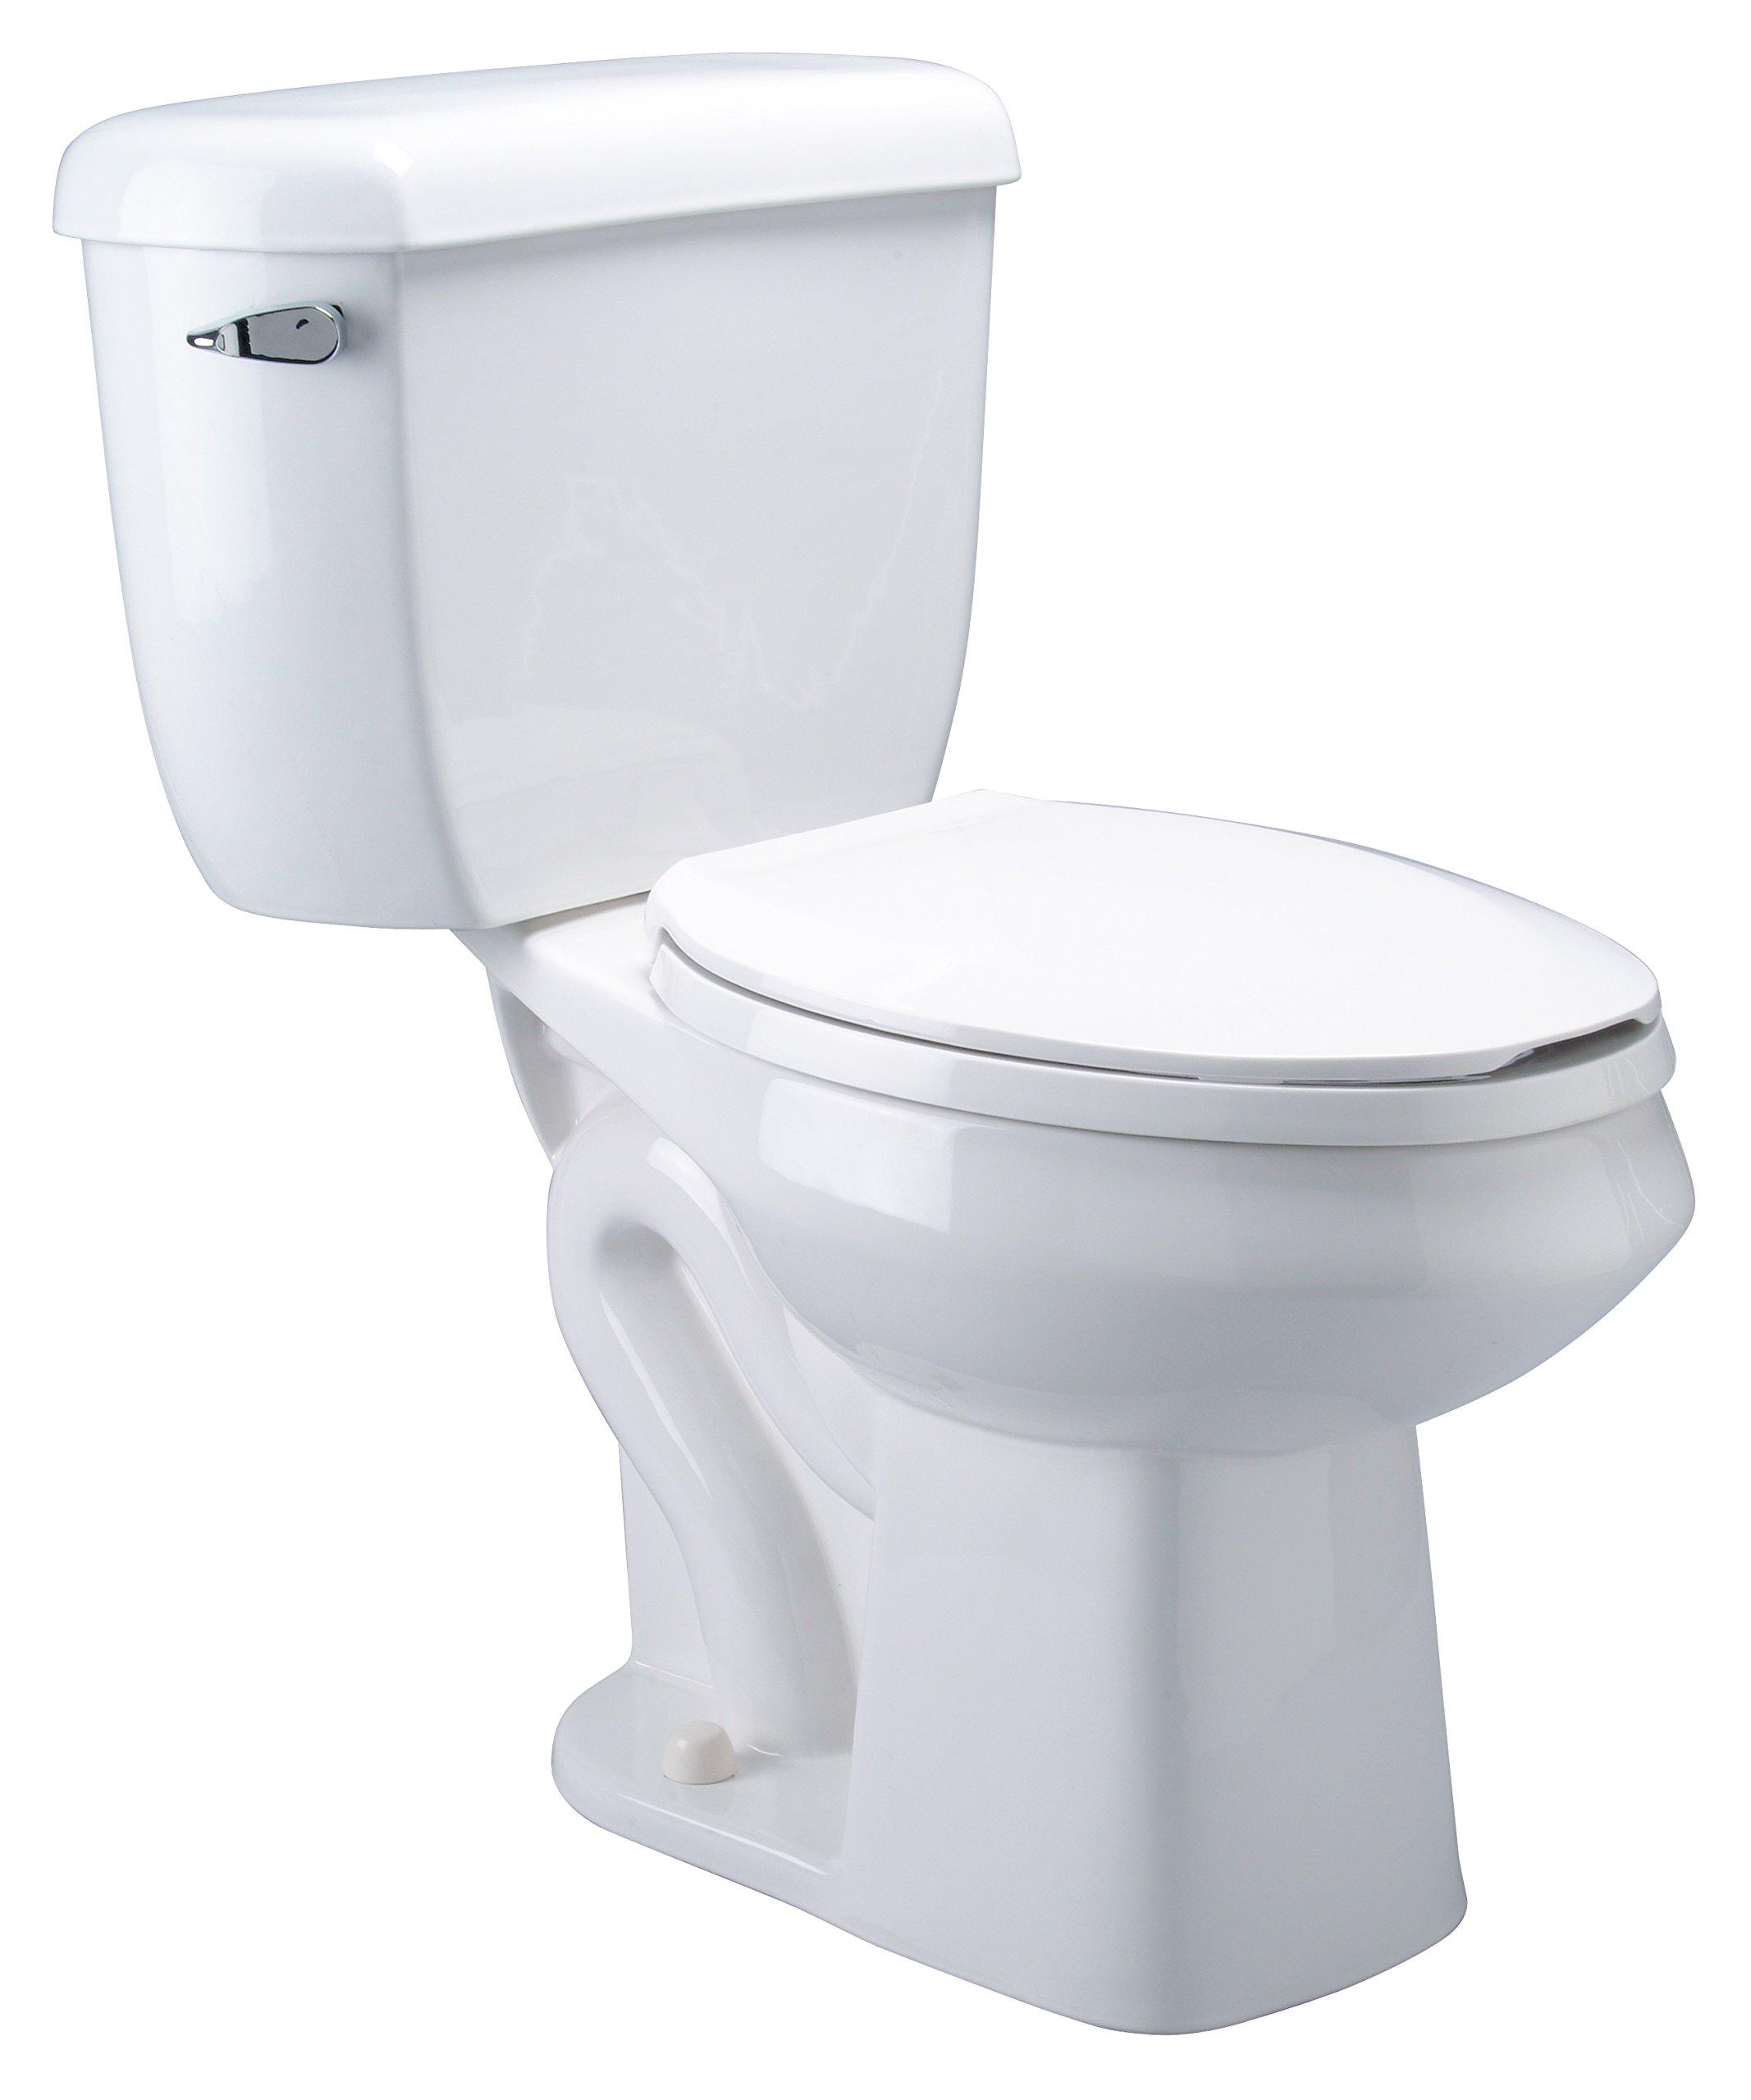 Zurn Z5560 ADA, Elongated Pressure Assist, 1.6 gpf, Two-Piece Toilet